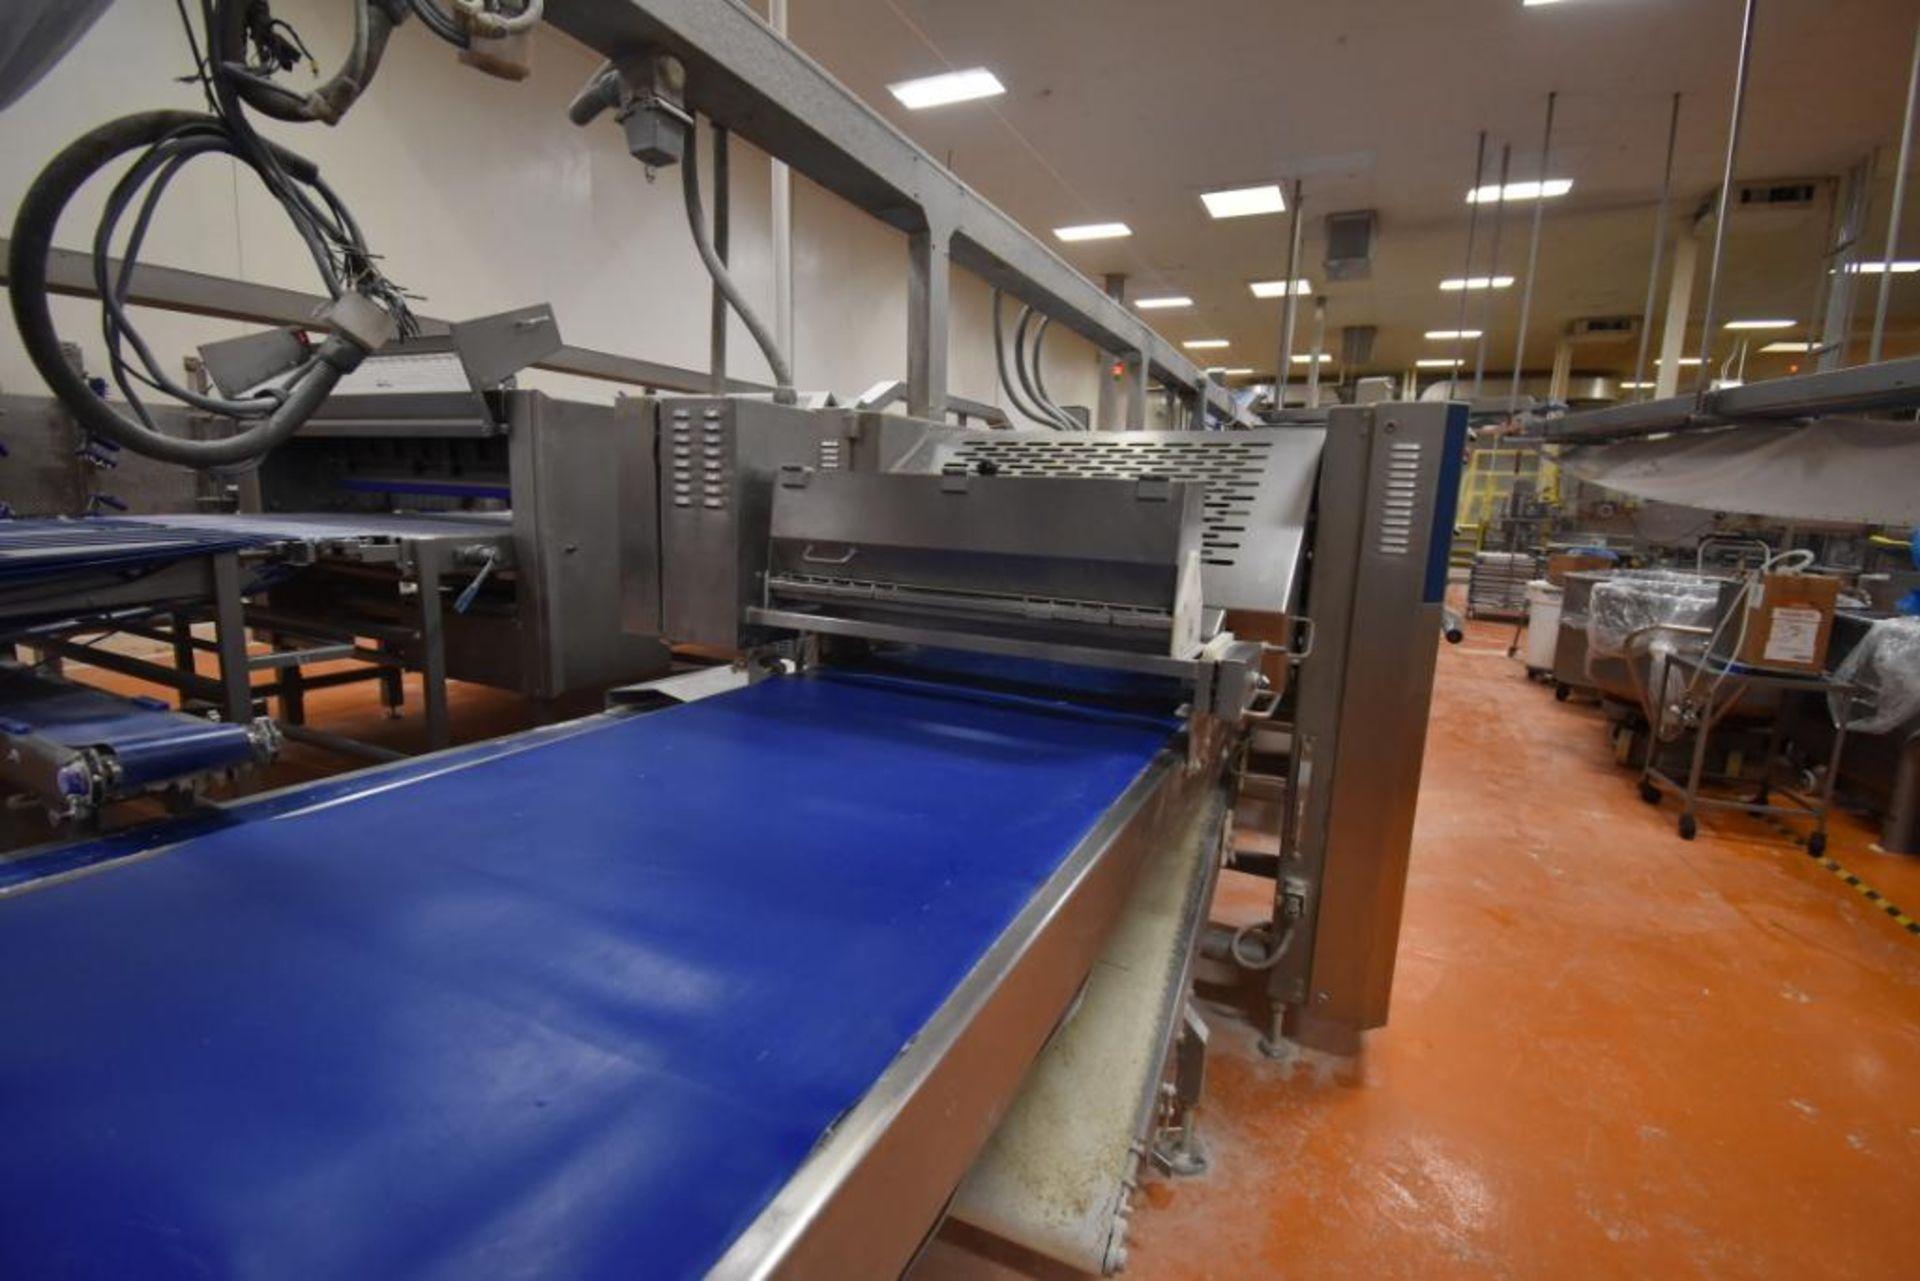 2007 Fritsch Laminator 3000 dough line - Image 58 of 280